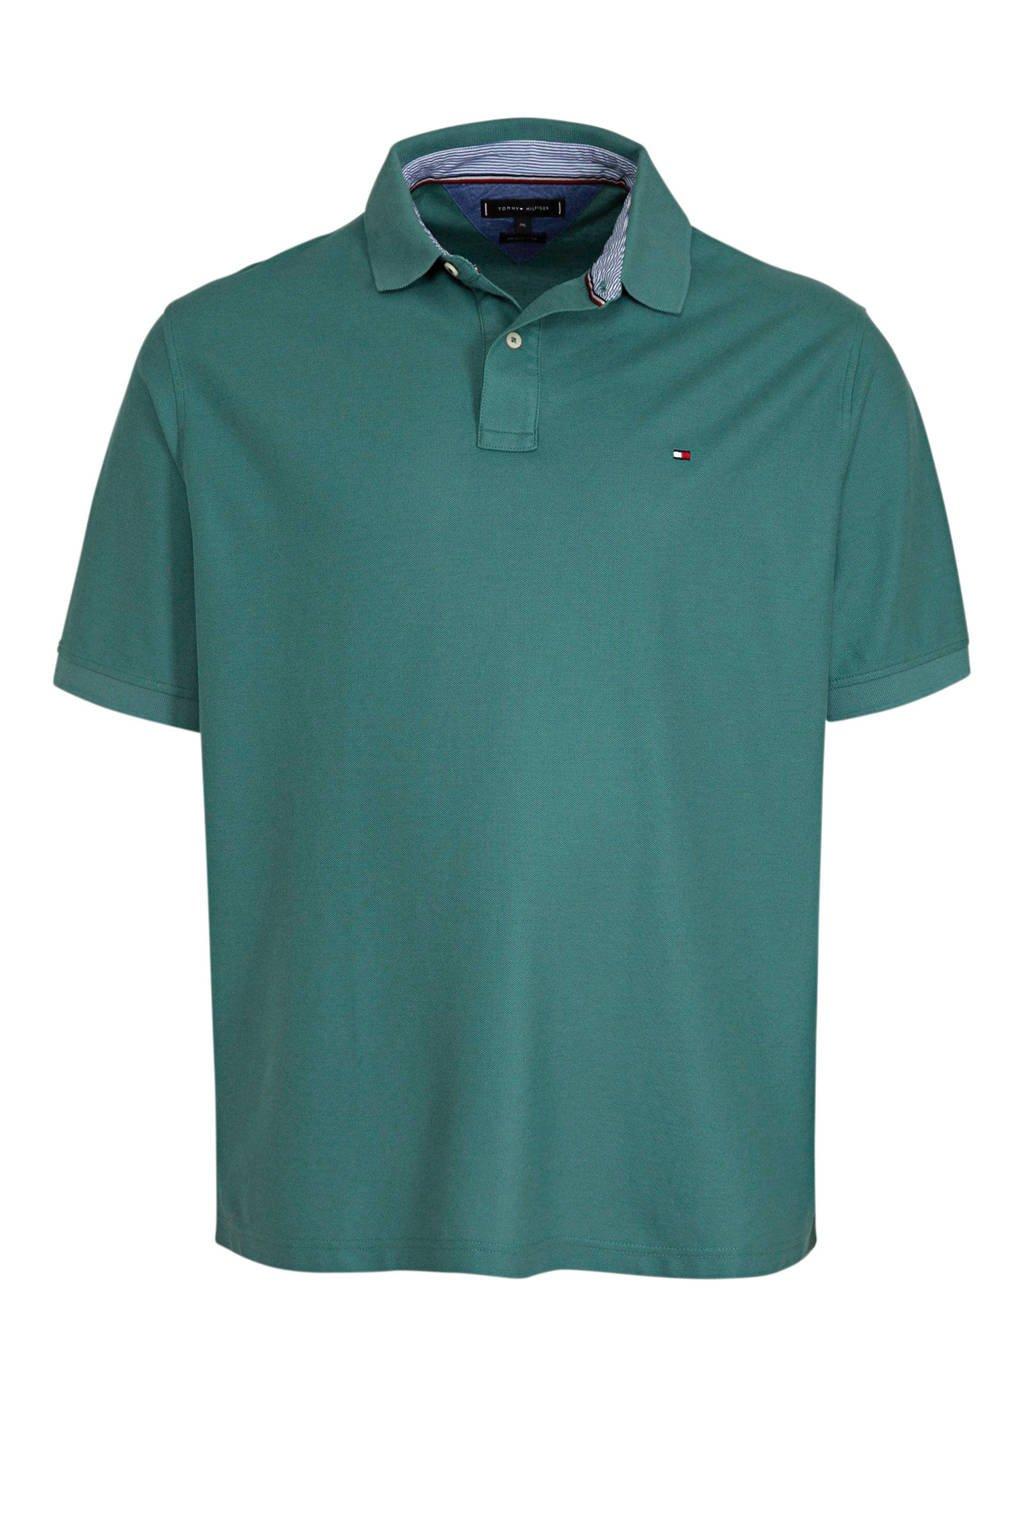 Tommy Hilfiger Big & Tall +size regular fit polo groen, Groen